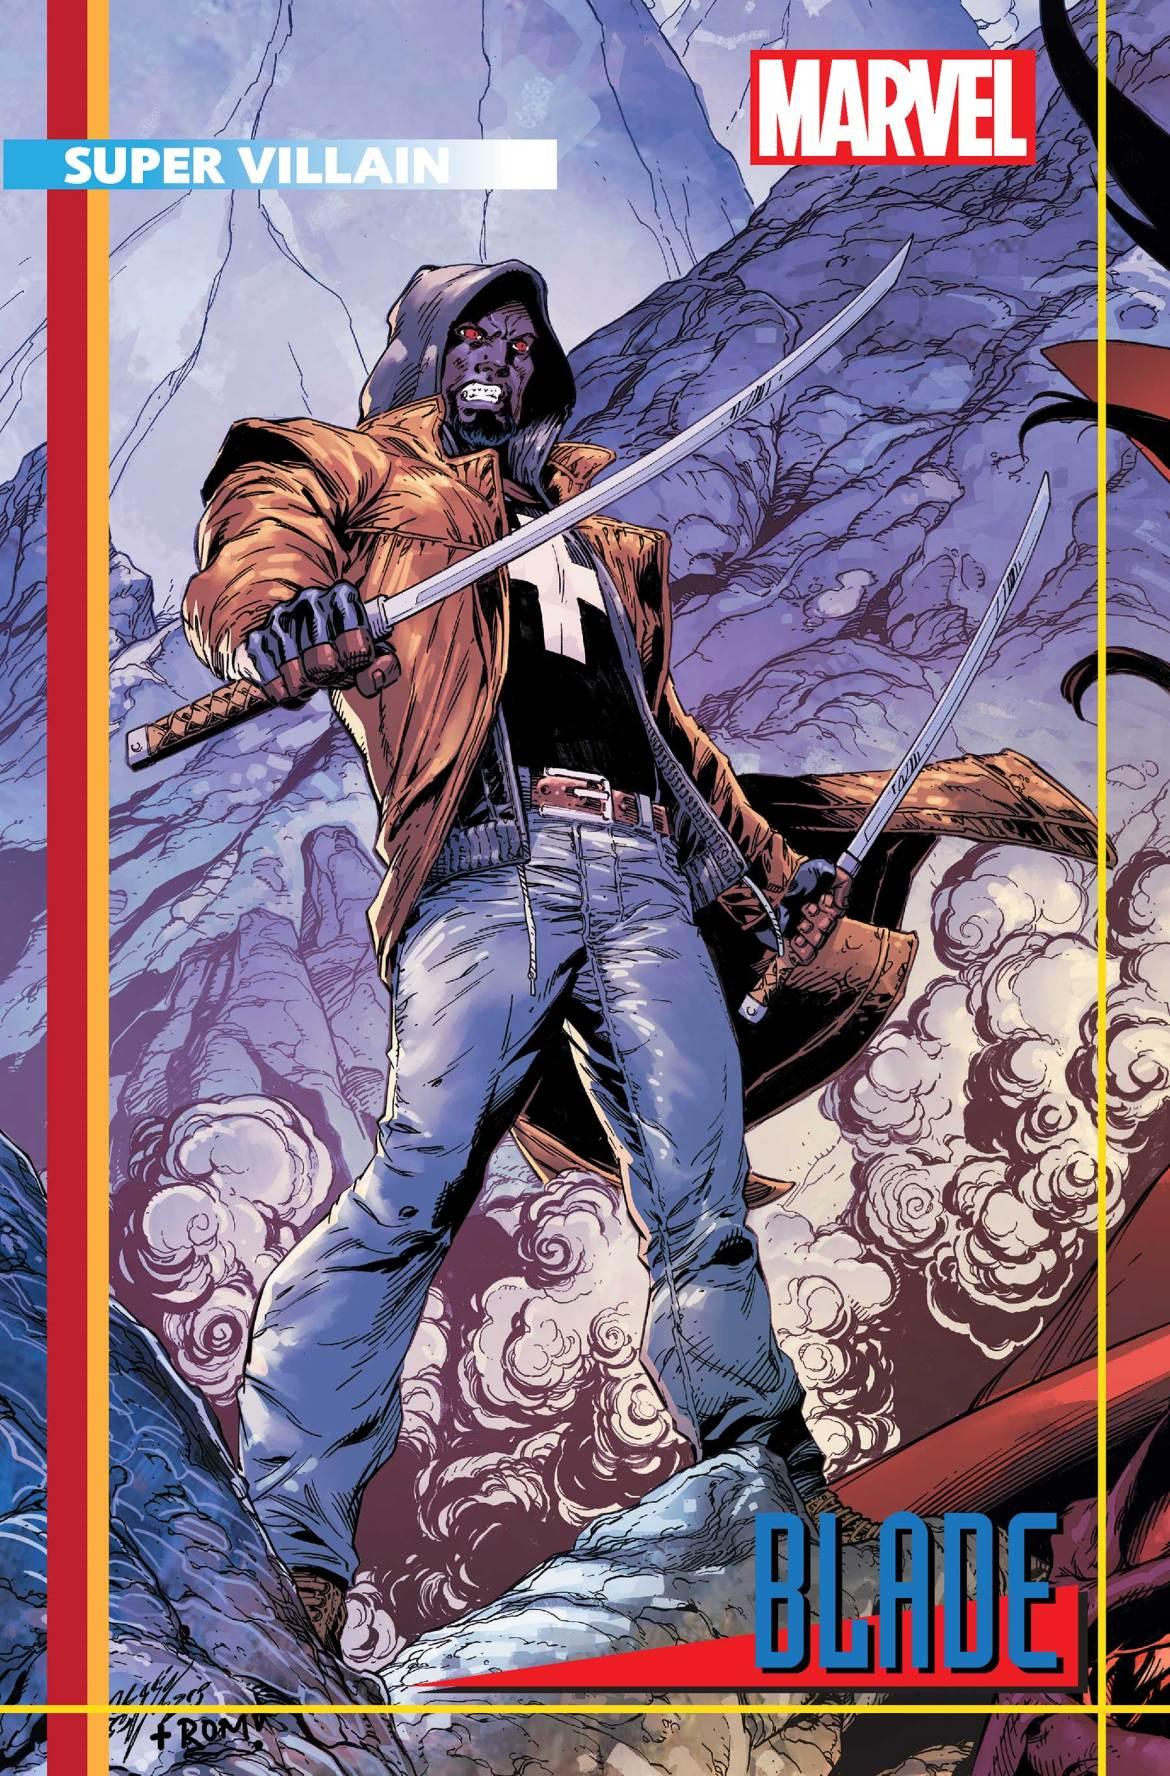 HEROESREBORN2021001_Trading_Card_Var_A-1 Marvel Comics May 2021 Solicitations